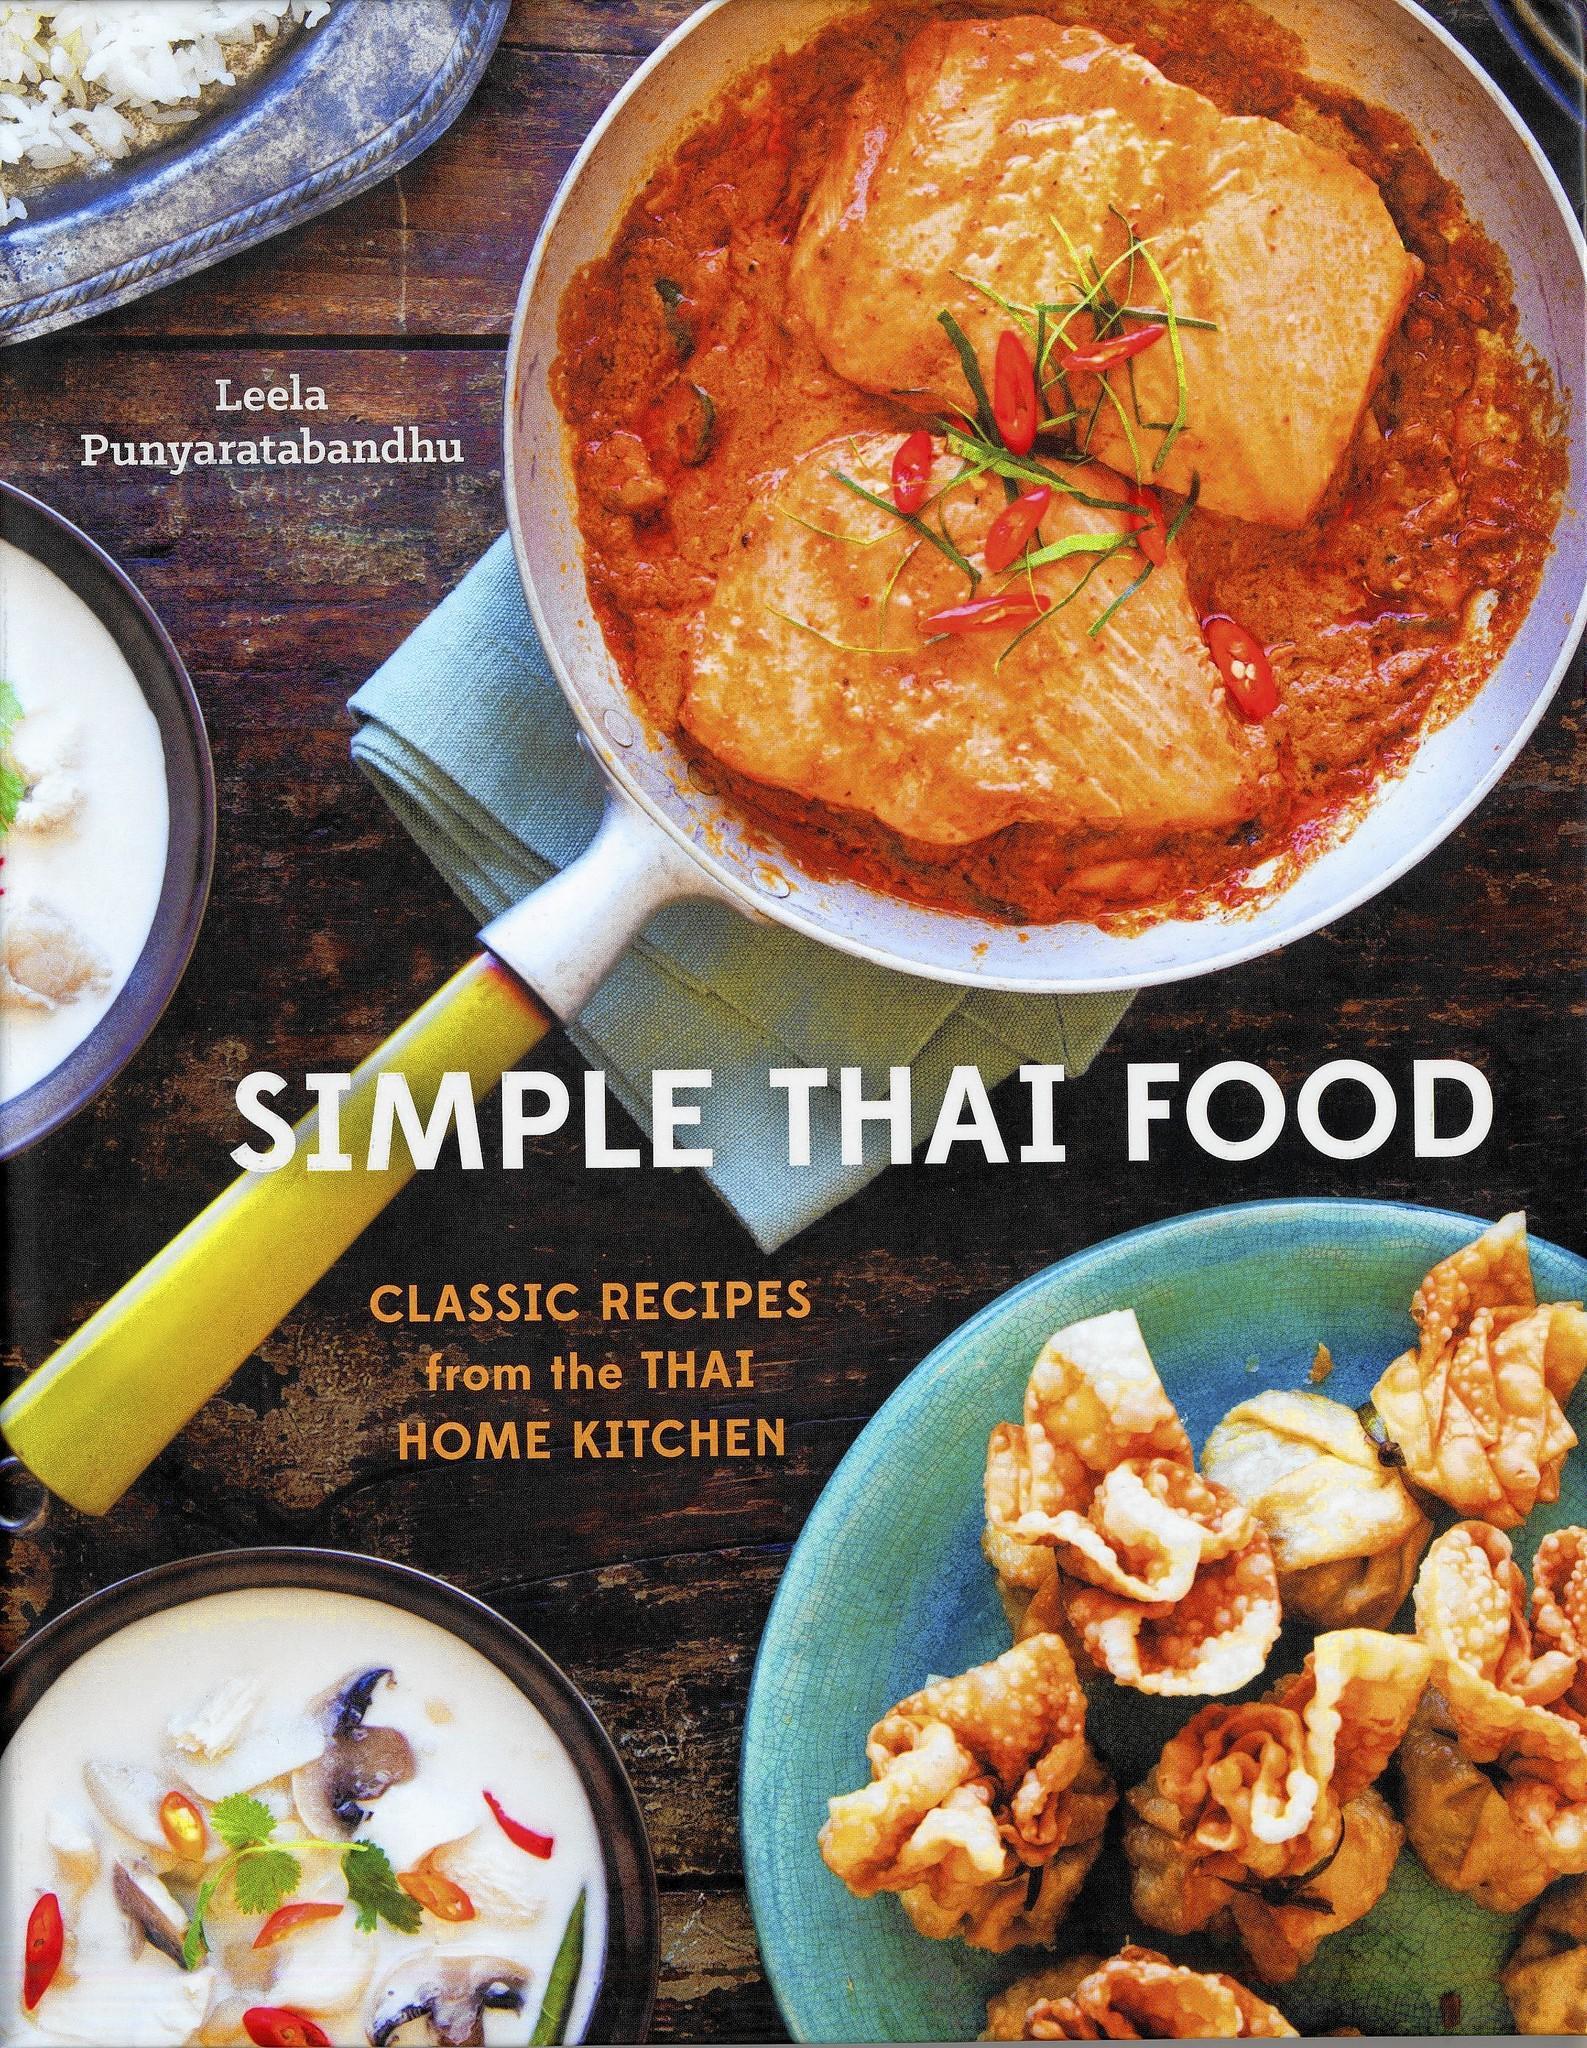 imple Thai Food by Leela Punyaratabundhu.